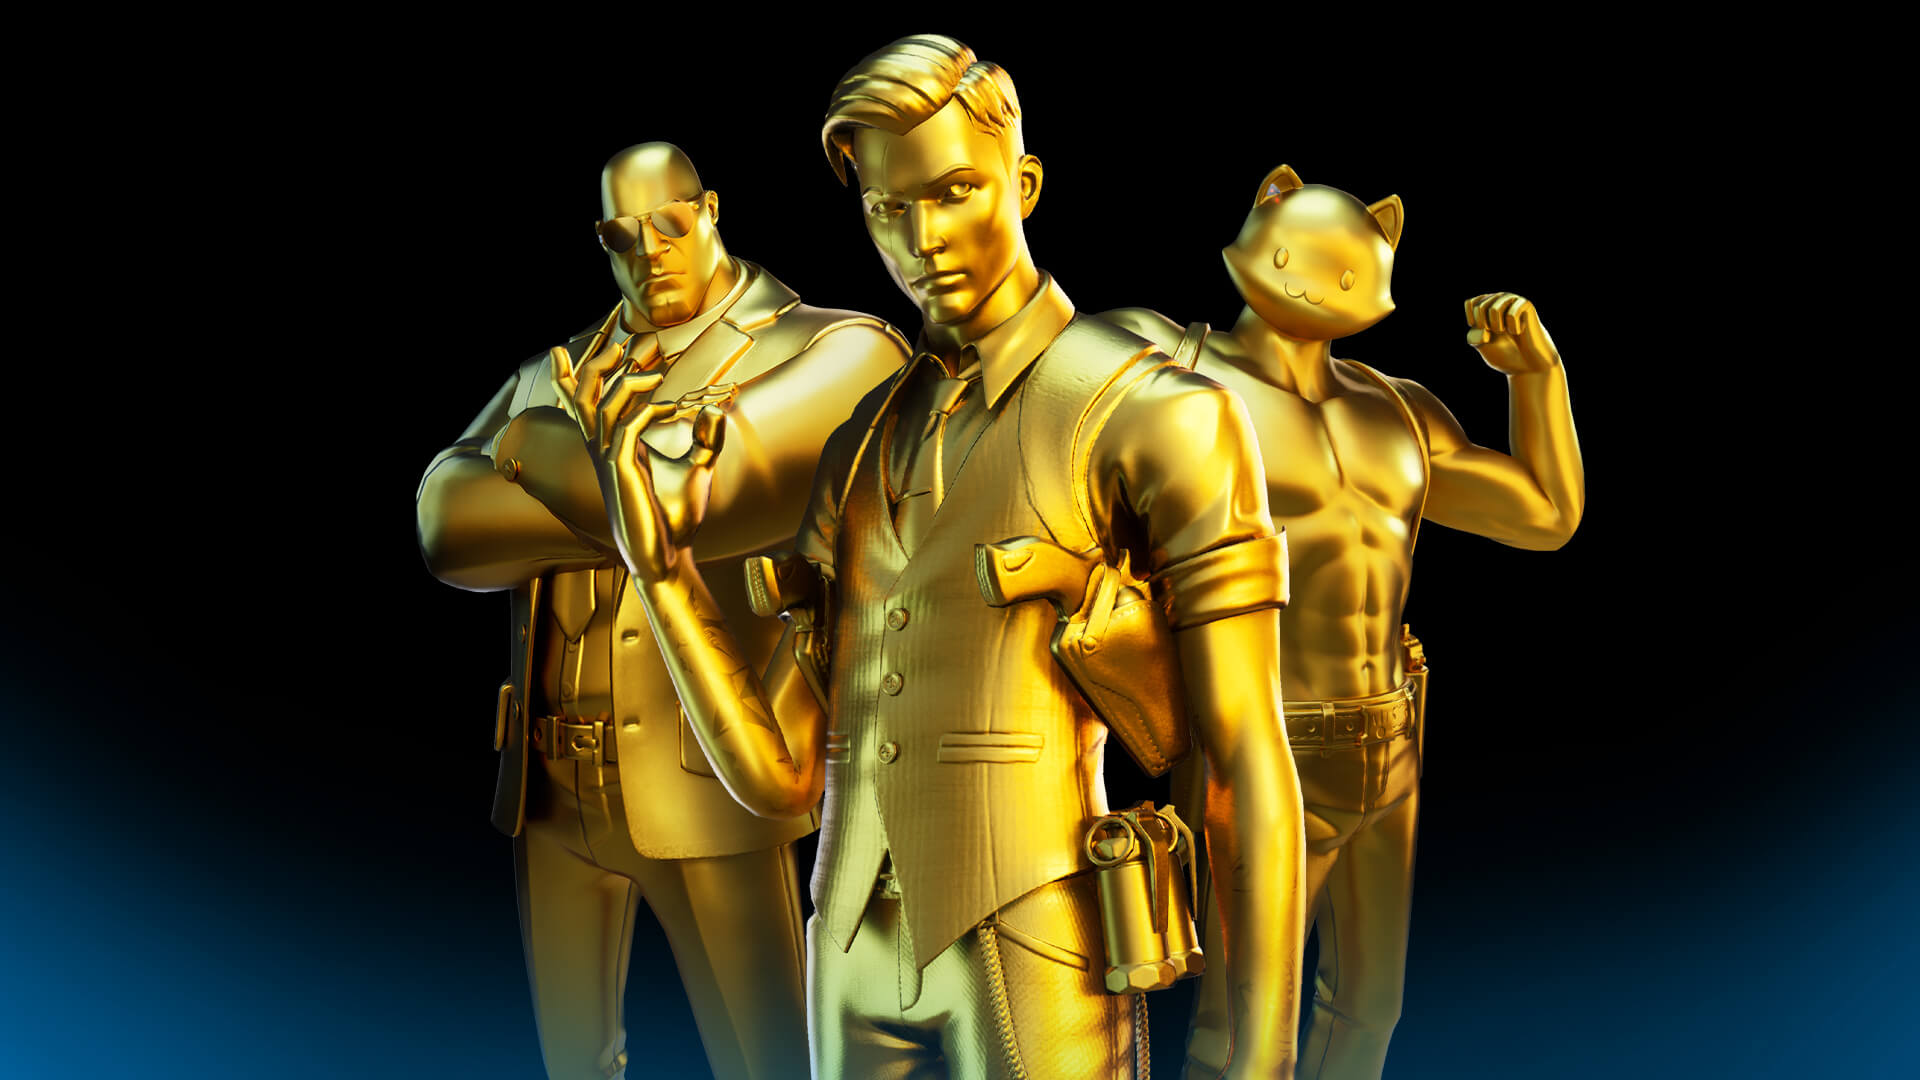 Fortnite 12.60 Arrives Tomorrow, Spy Games LTM and More